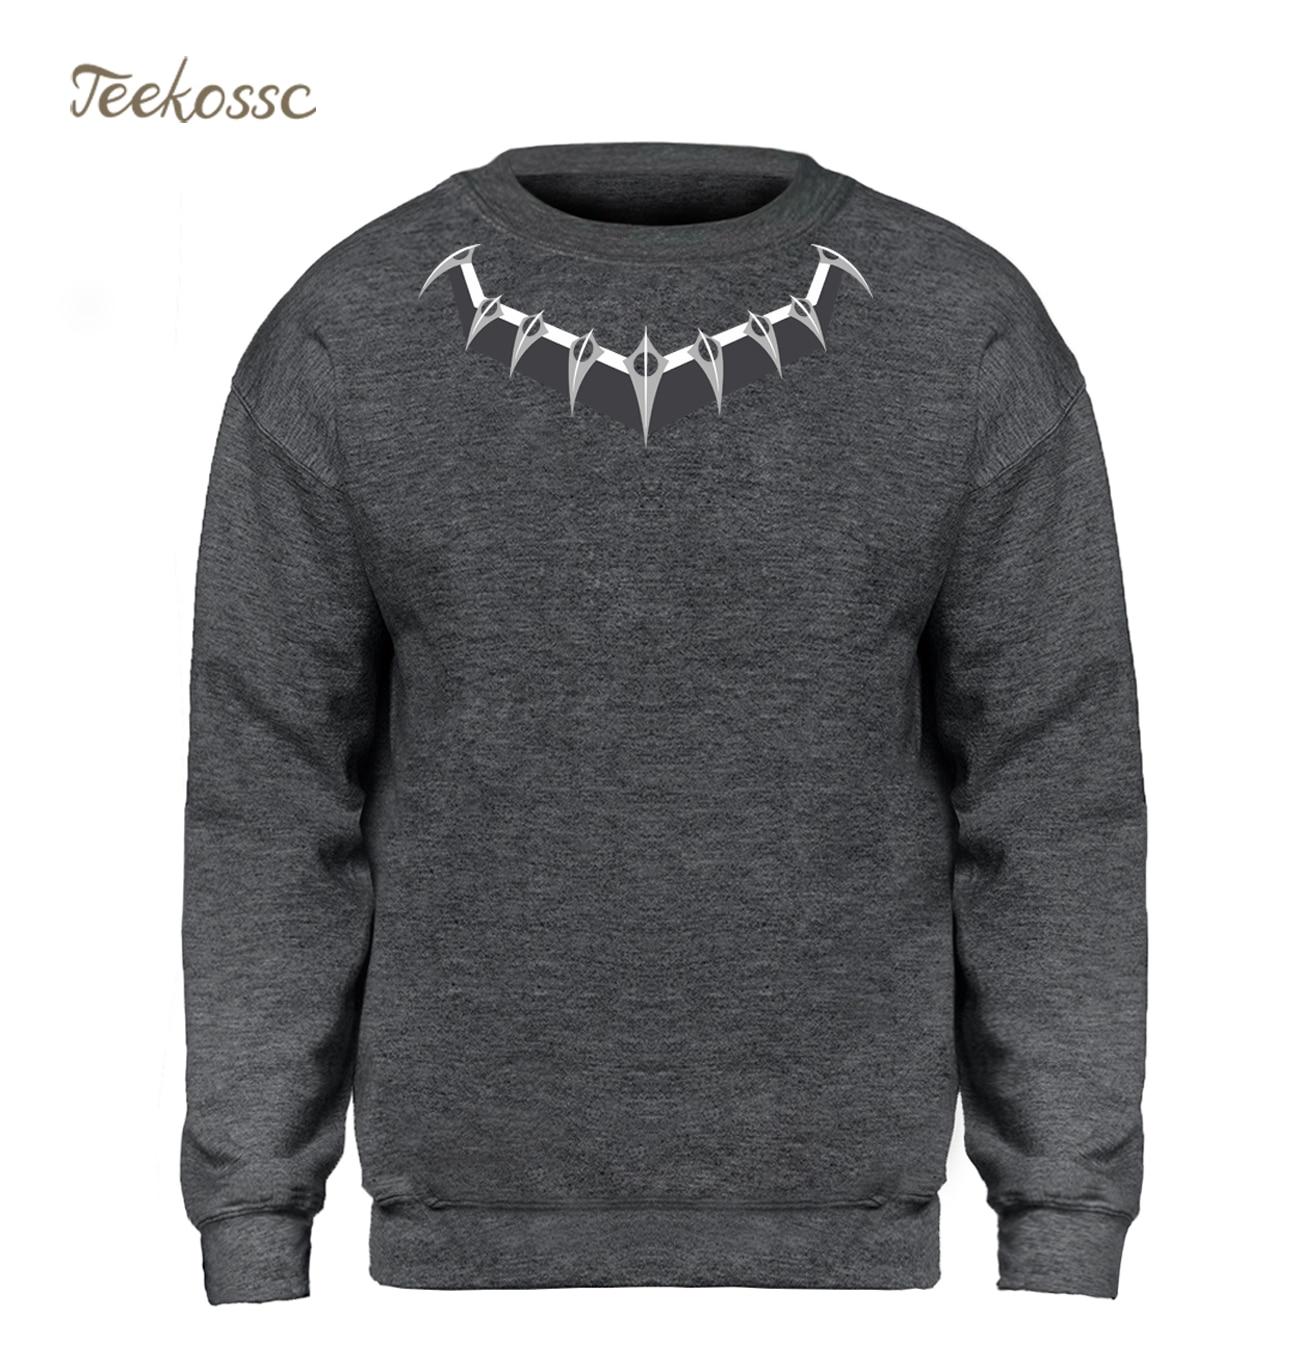 Black Panther Killmonger Hoodie Men Necklace Logo Sweatshirt Movie Crewneck Sweatshirts 2018 New Brand Fleece Hip Hop Sportswear